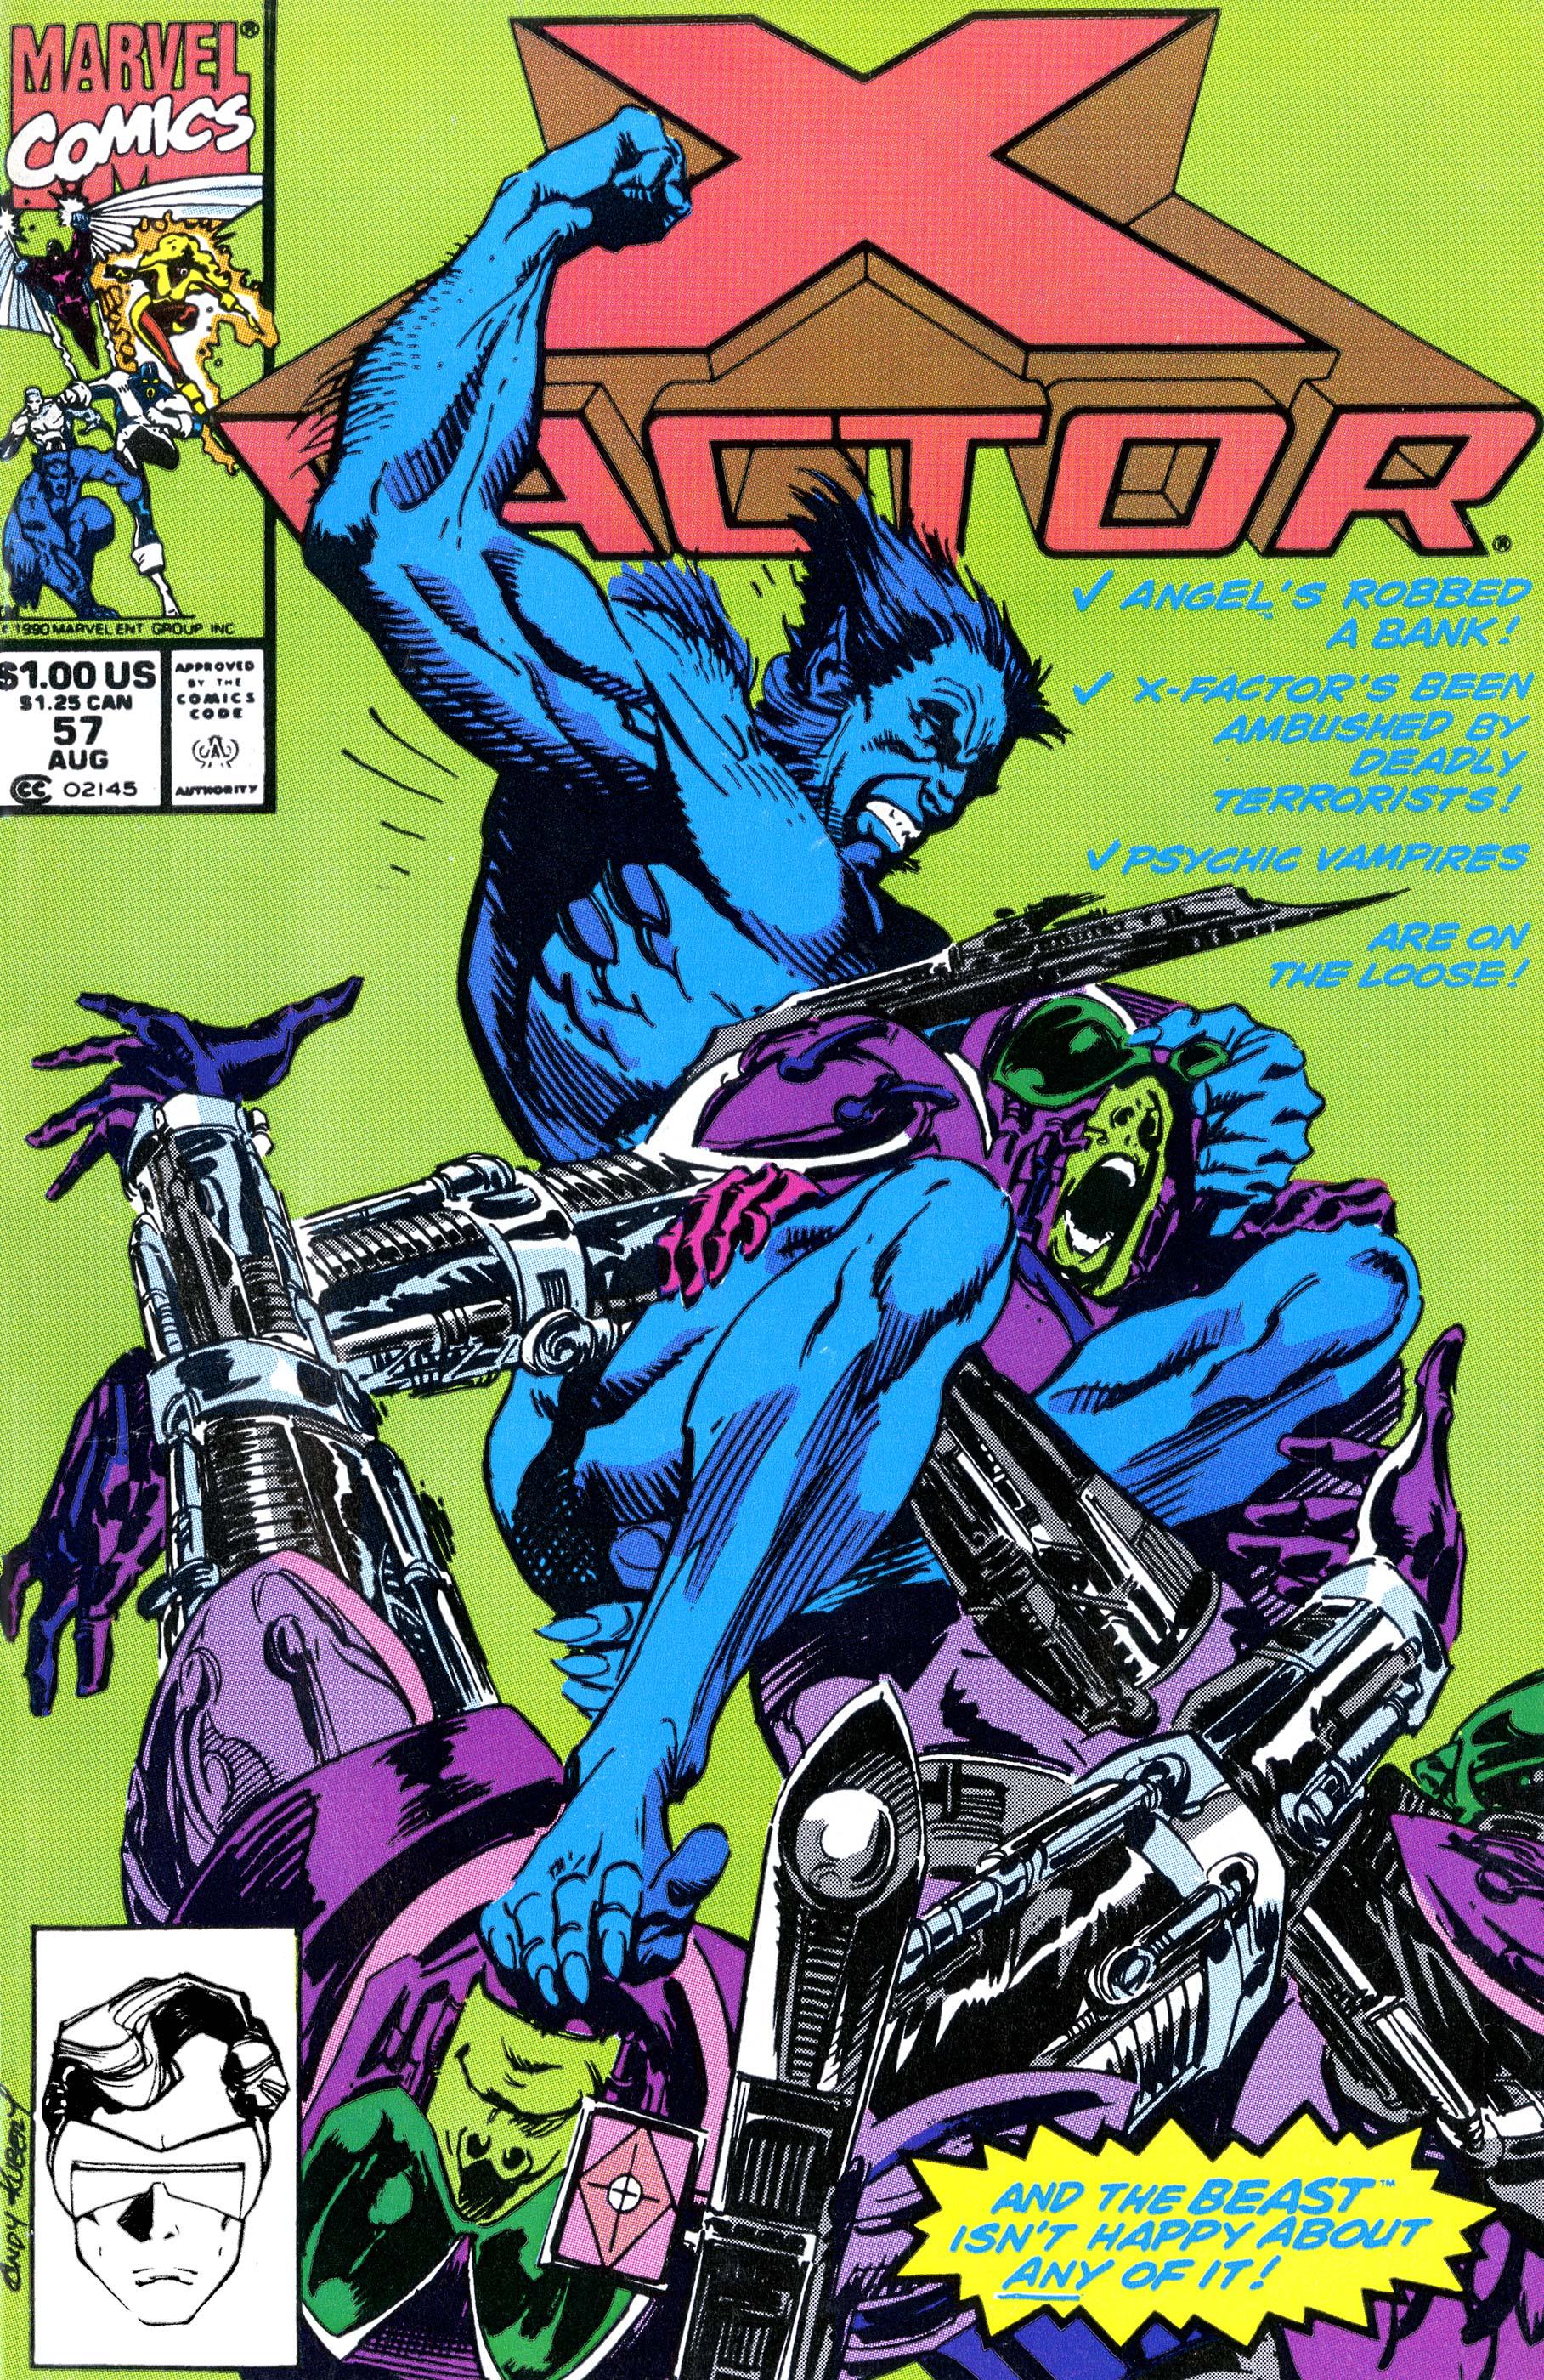 X-Factor (1986) #57